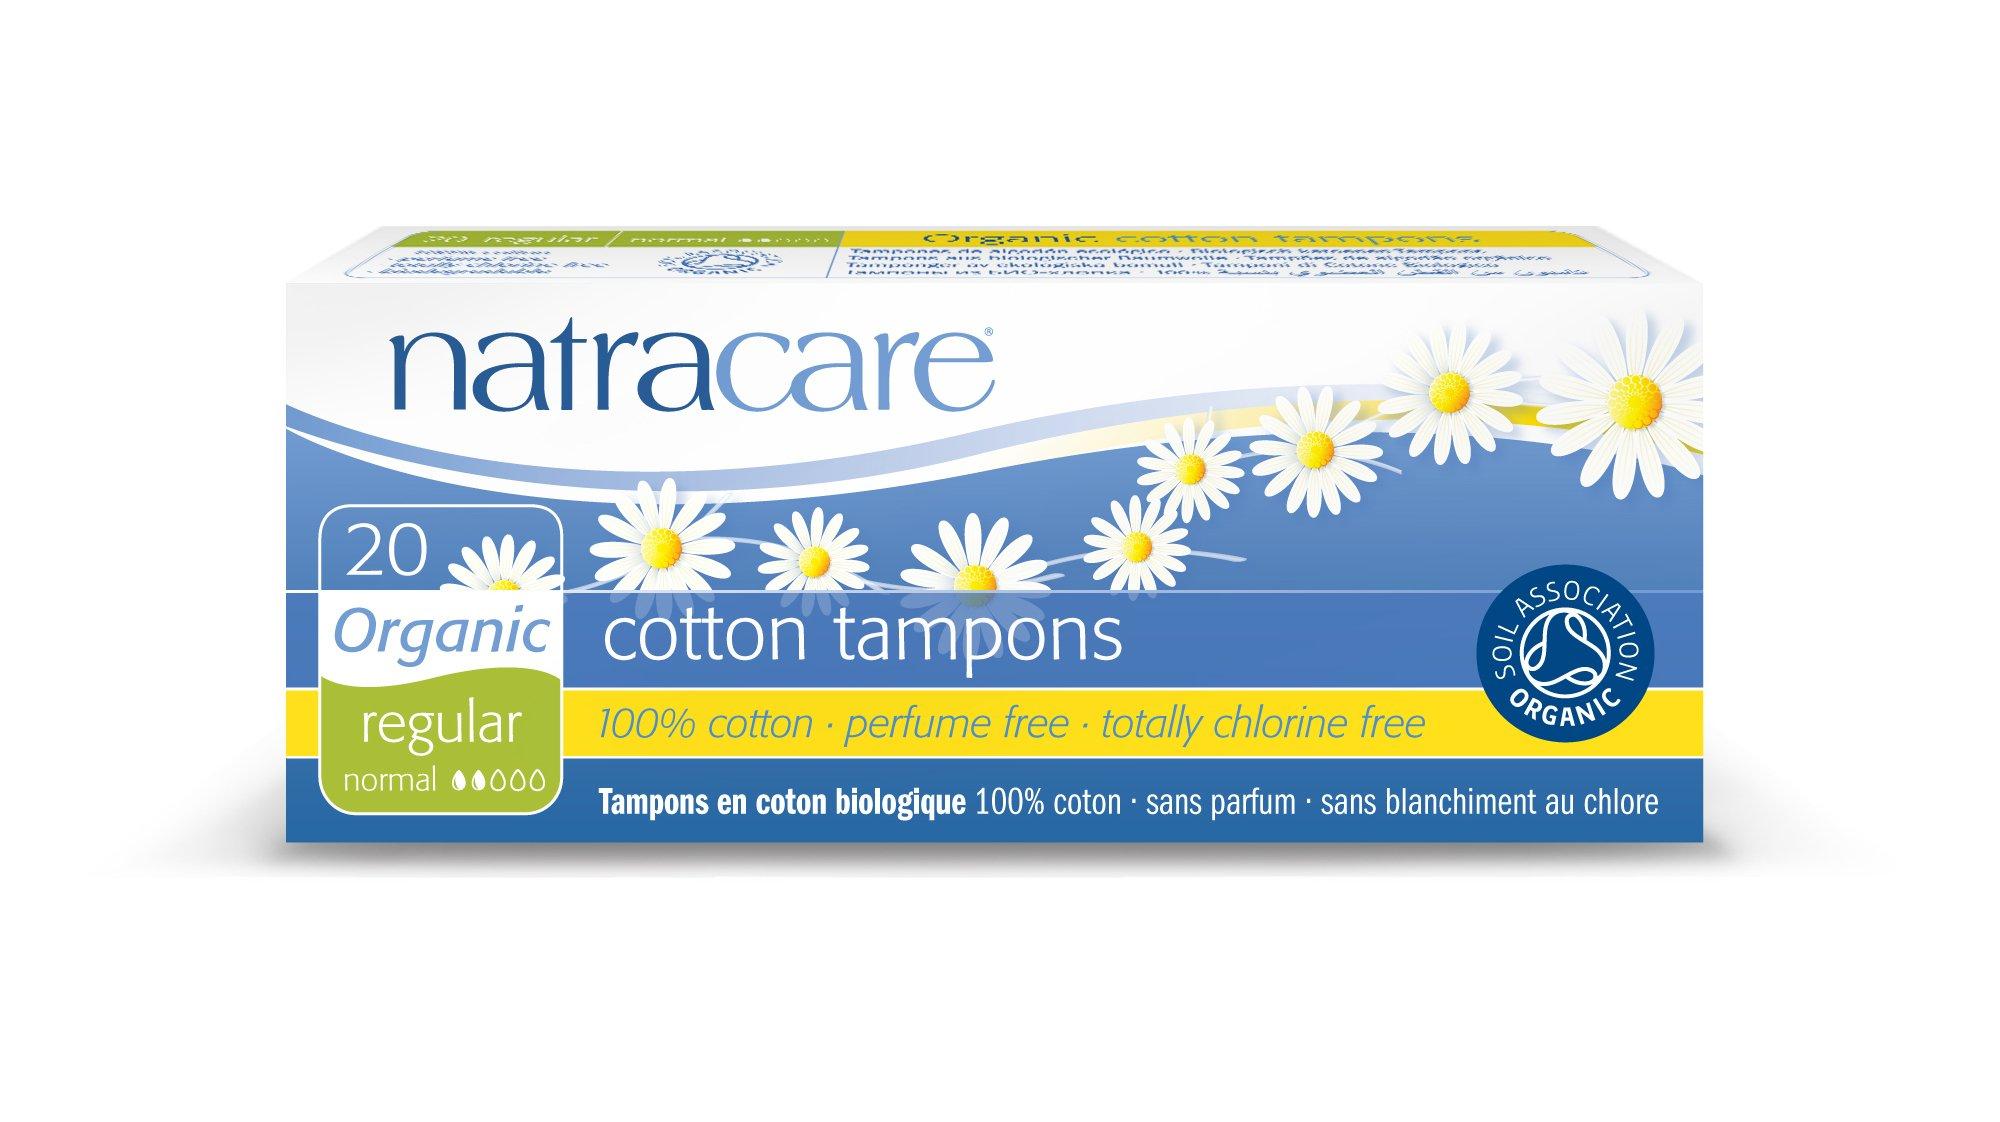 Natracare, Organic Regular Tampons, 20 Count